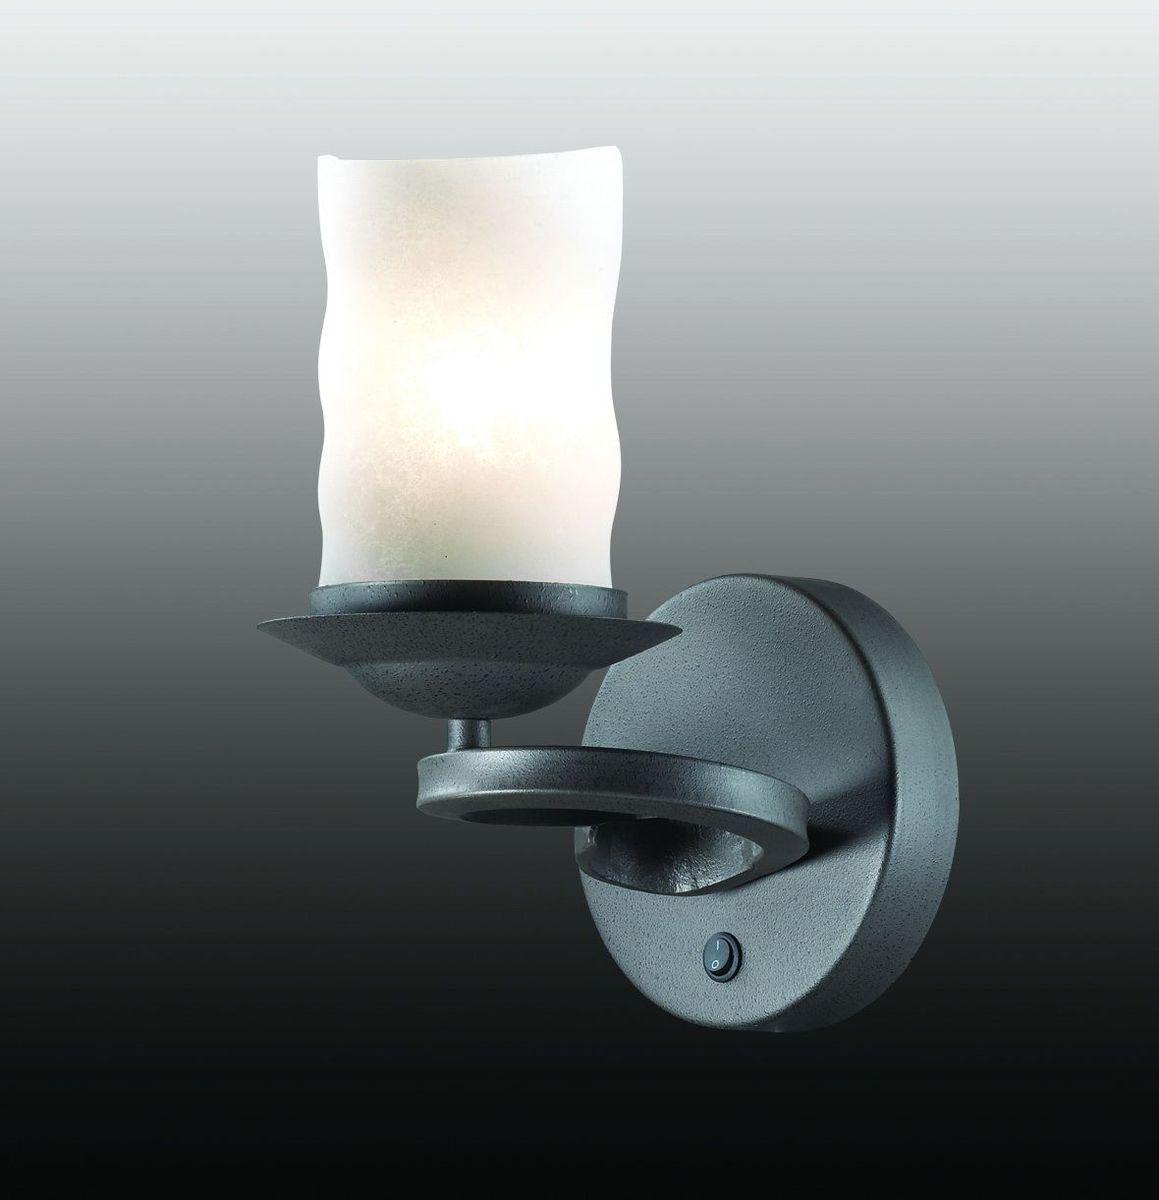 Бра Odeon Light Brin, 1 х E27, 60W. 2766/1W odeon light бра odeon light brin 2766 1w